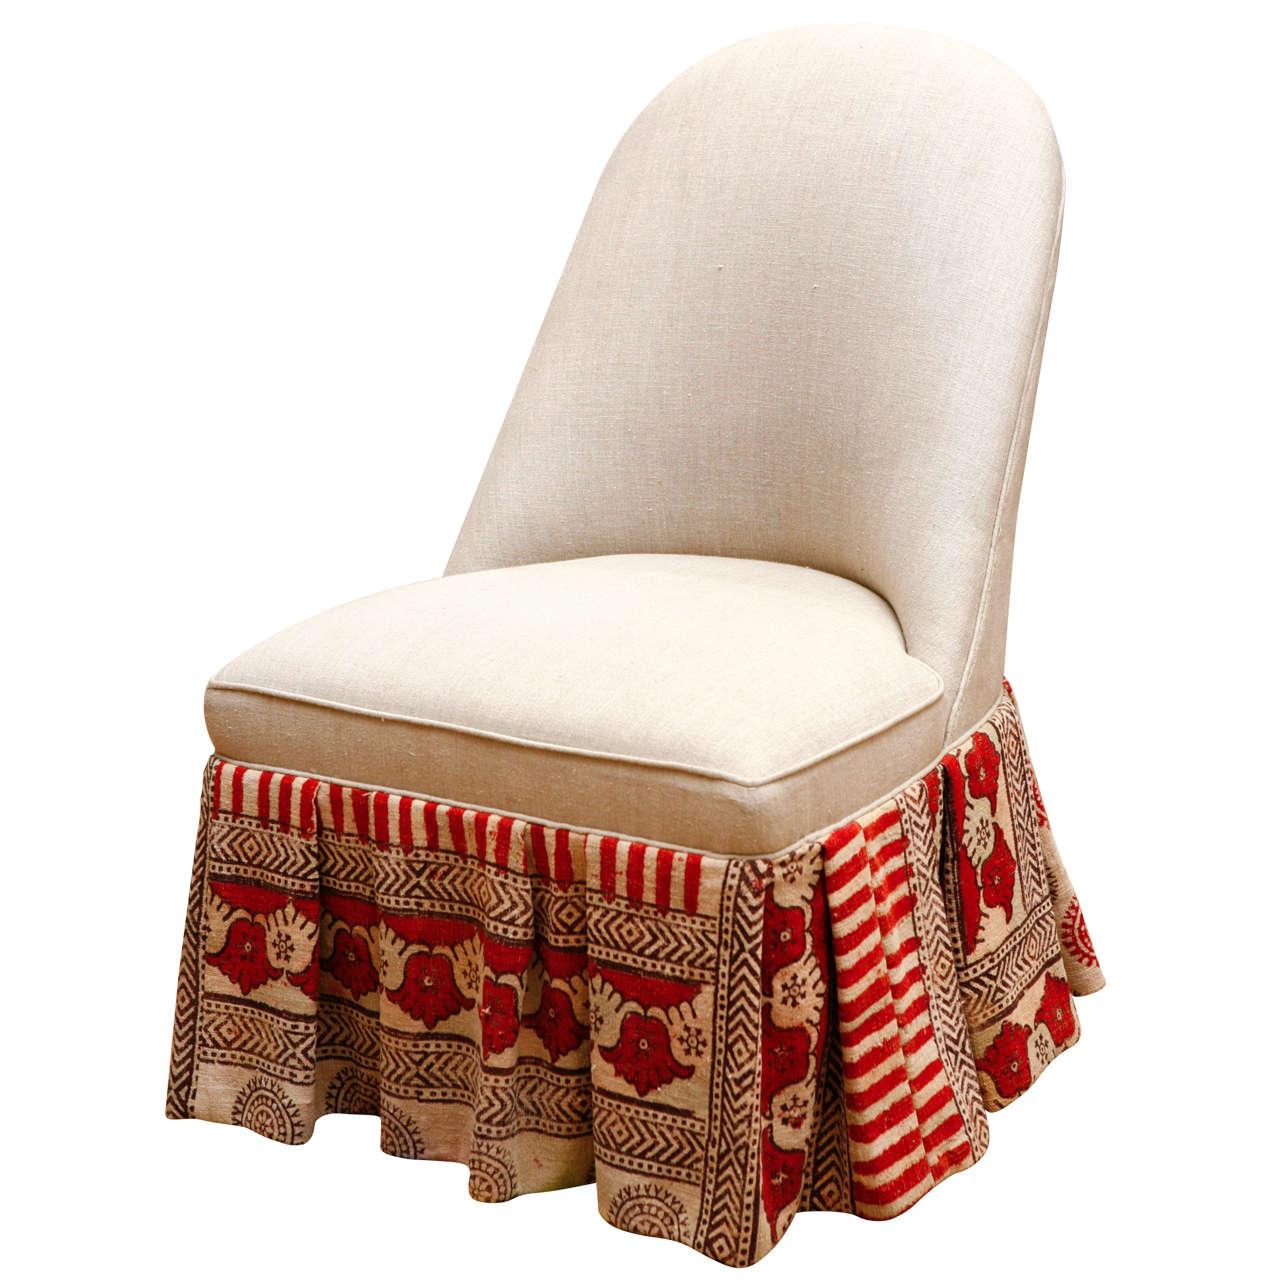 Slipper Chair With Vintage Indian Kalamkari Fabric At 1stdibs